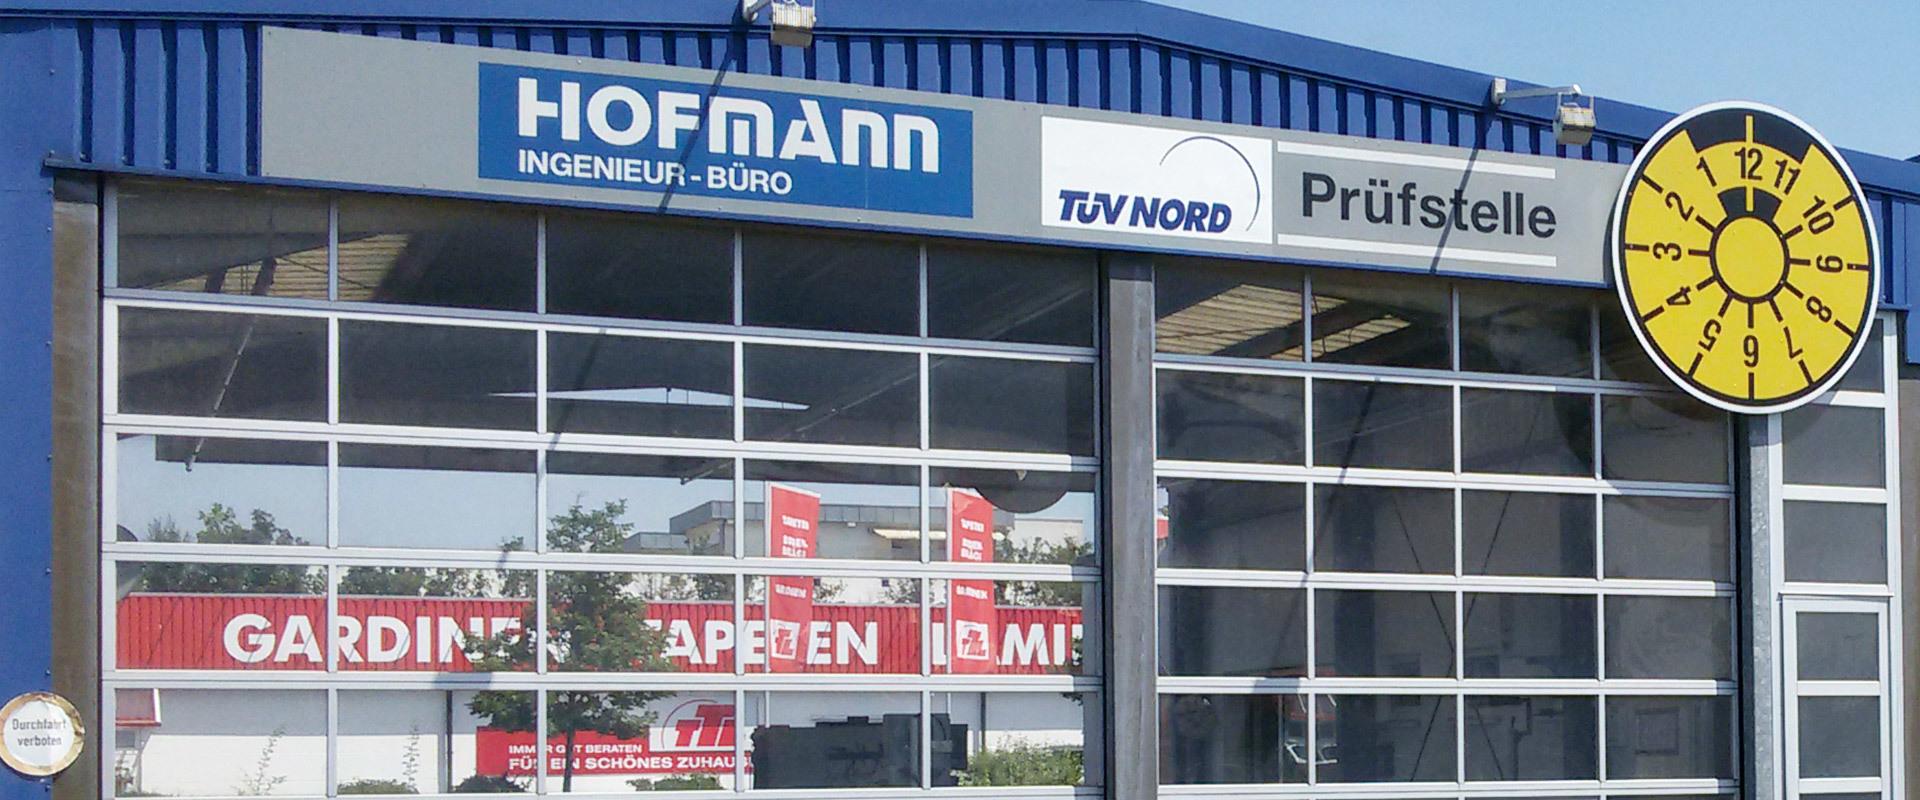 Ingenieurbüro Hofmann GmbH & Co.KG